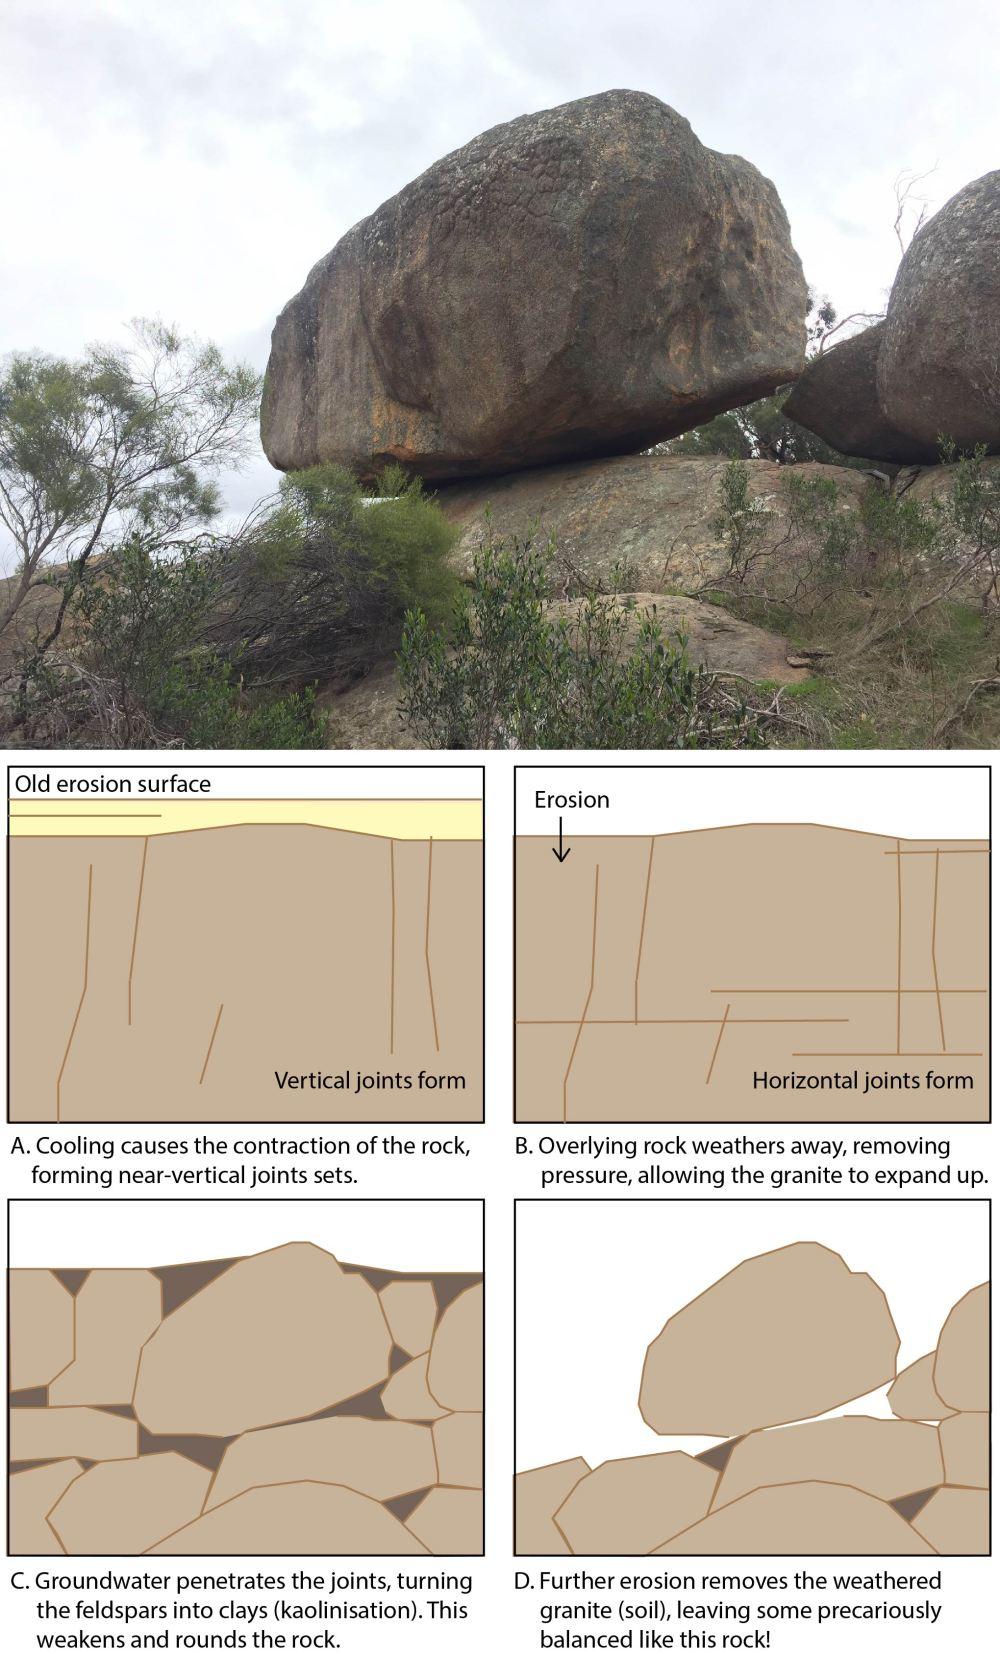 Precariously perched rocks